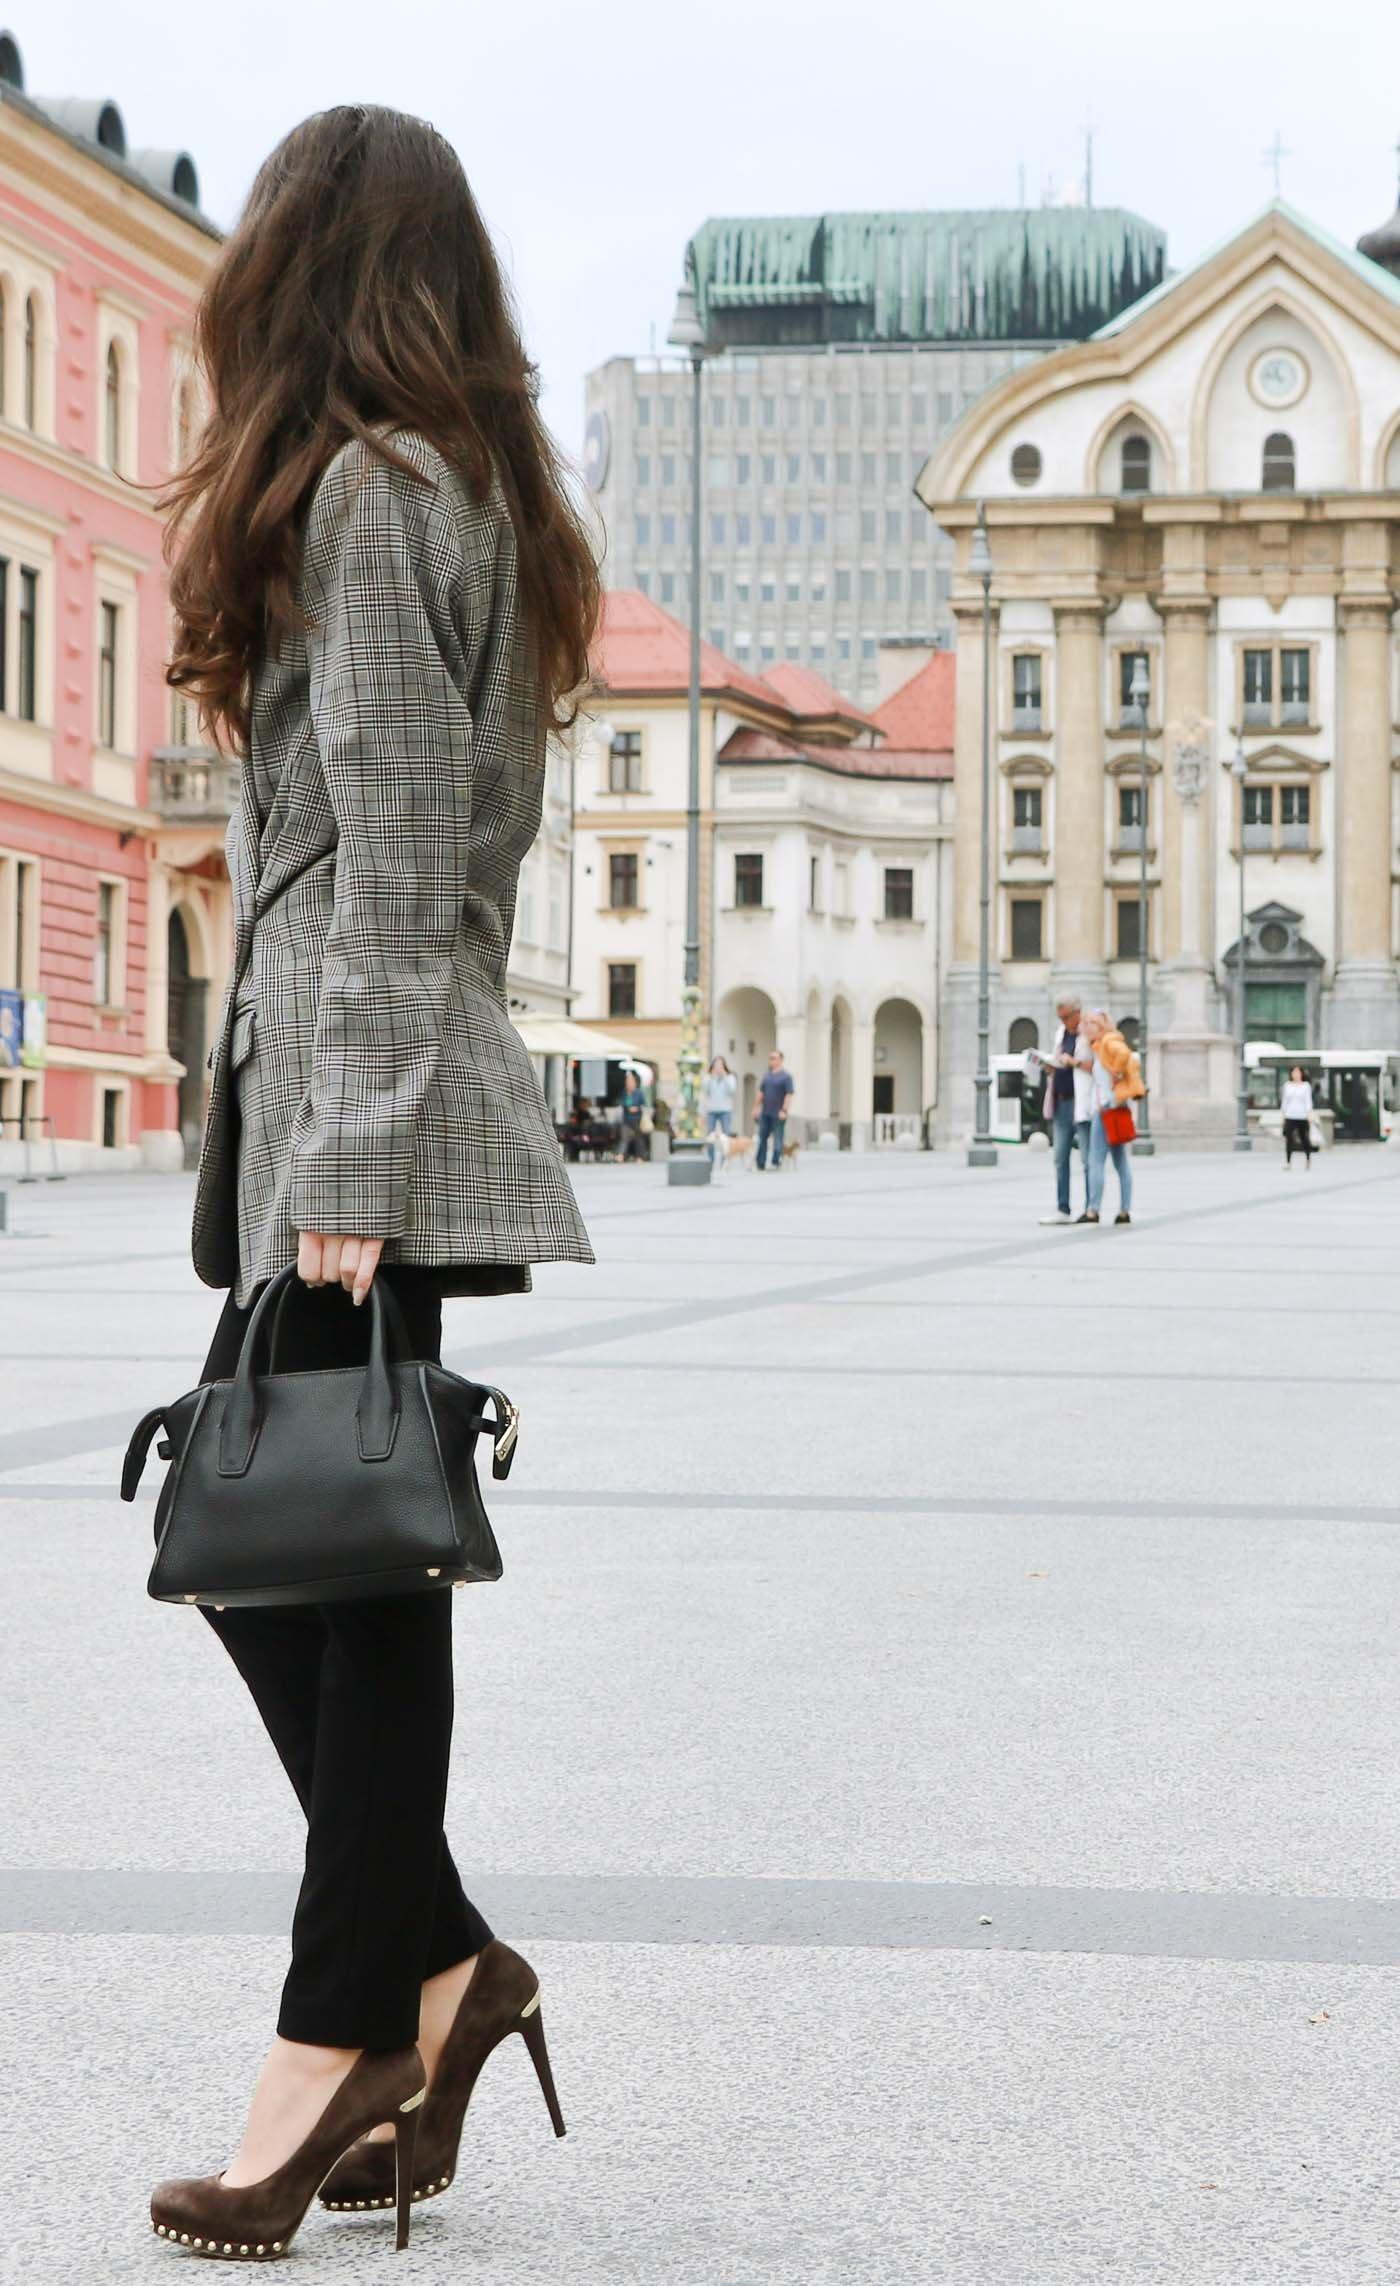 Fashion Blogger Veronika Lipar of Brunette from Wall Street wearing checked oversized boyfriend blazer